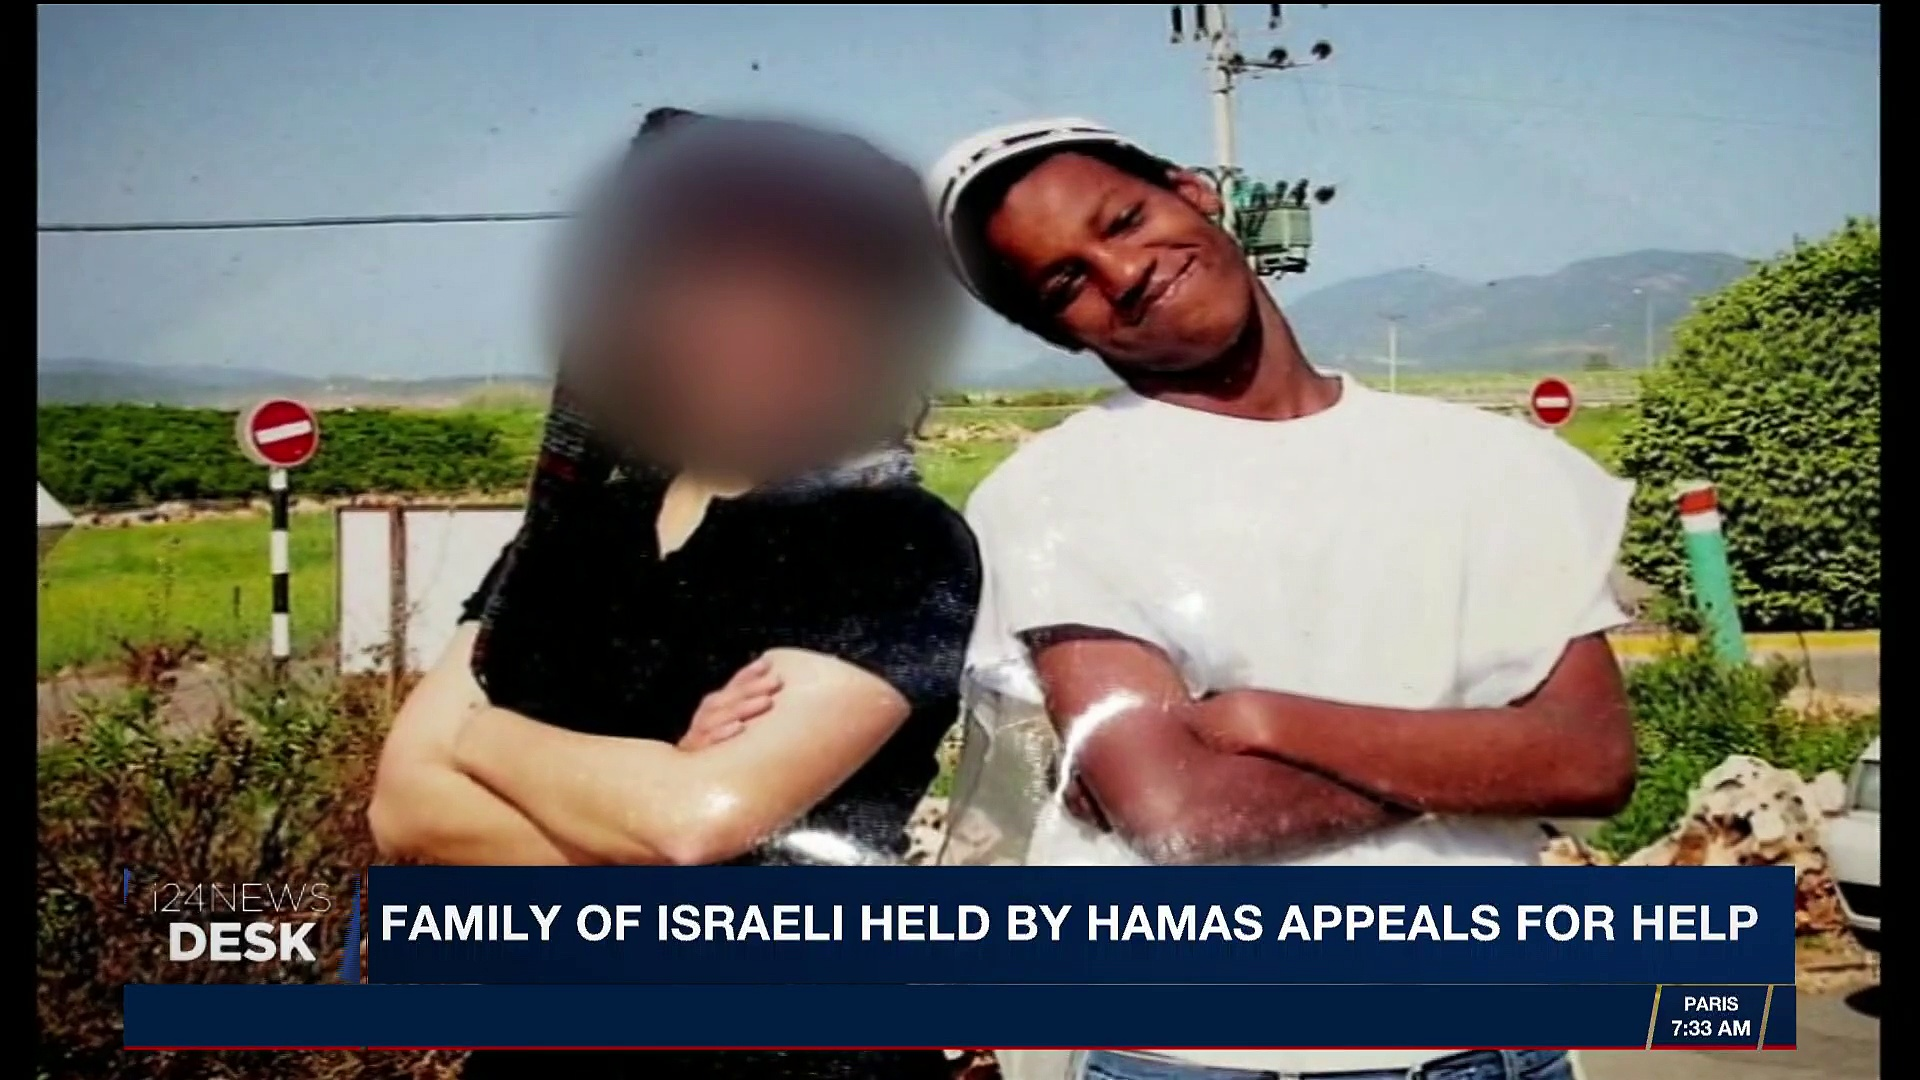 i24NEWS DESK | Family of Israeli held by Hamas appeals for help | Tuesday, November 21st 2017